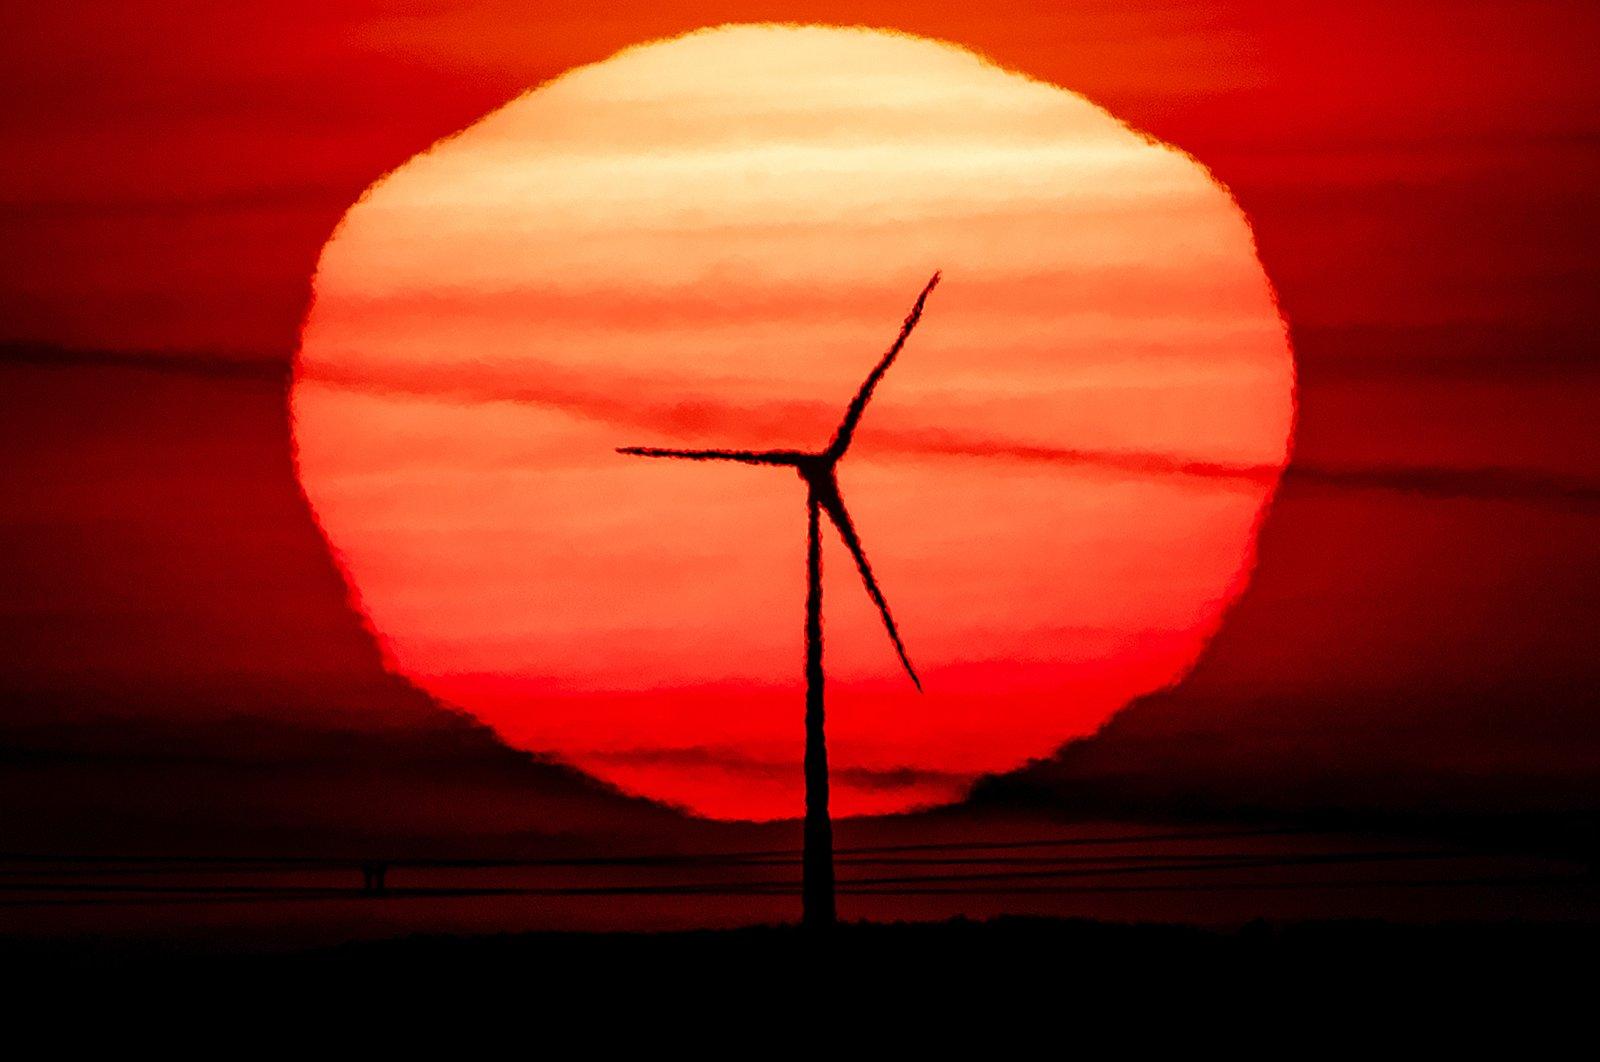 The sun rises behind a wind turbine in Frankfurt, Germany, Sept. 15, 2020. (AP File Photo/Michael Probst)